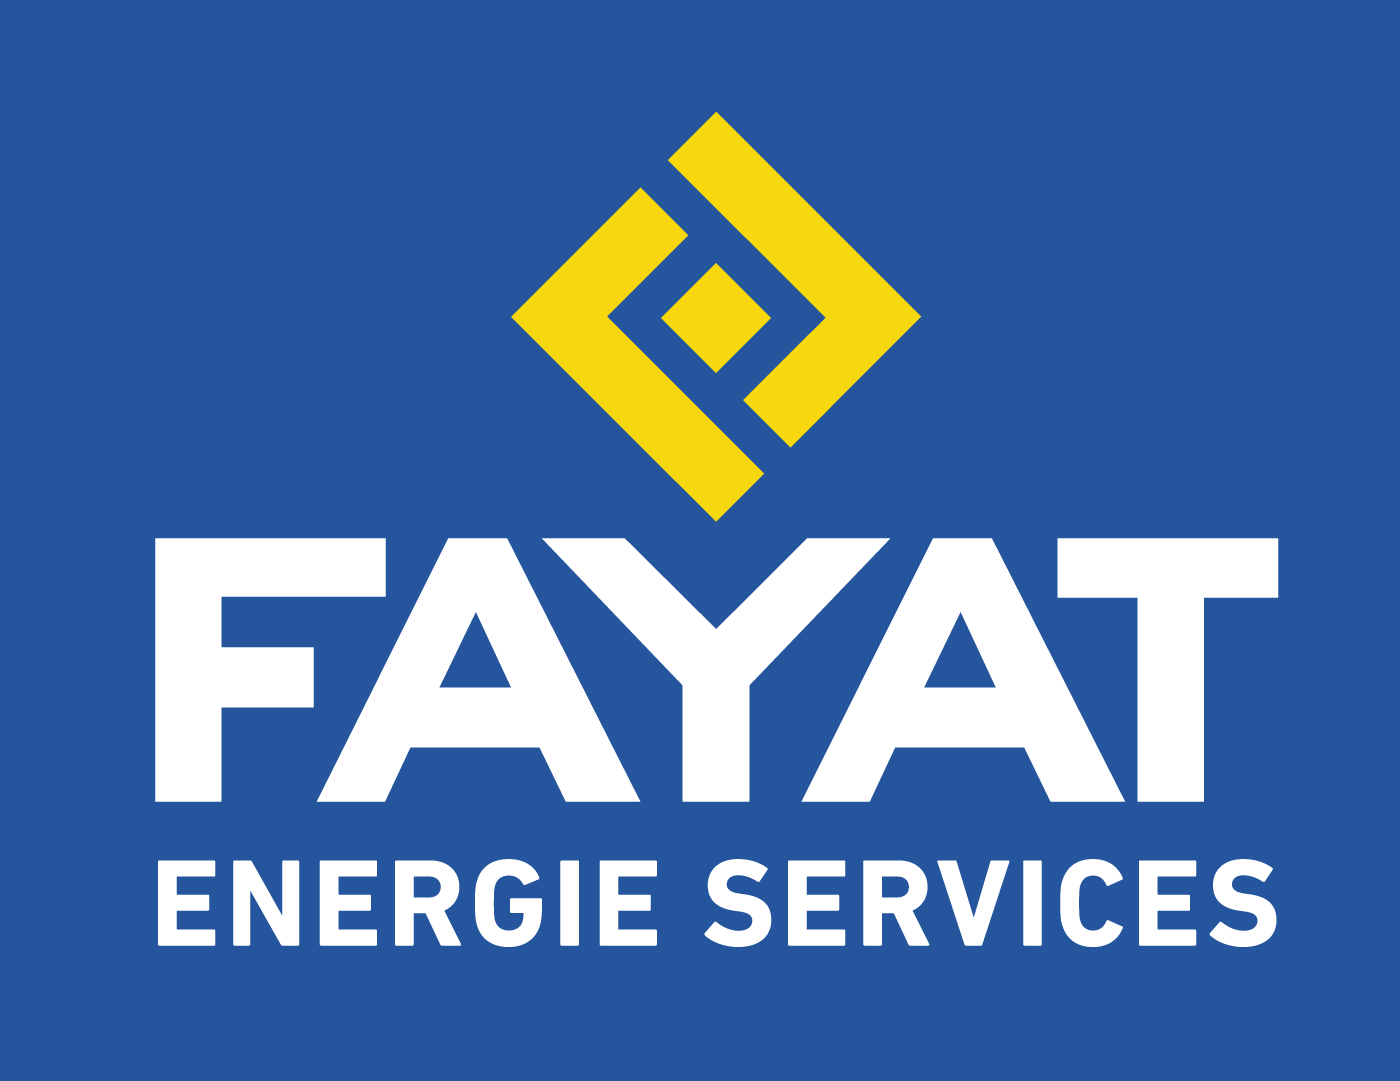 Le logo du groupe Fayat